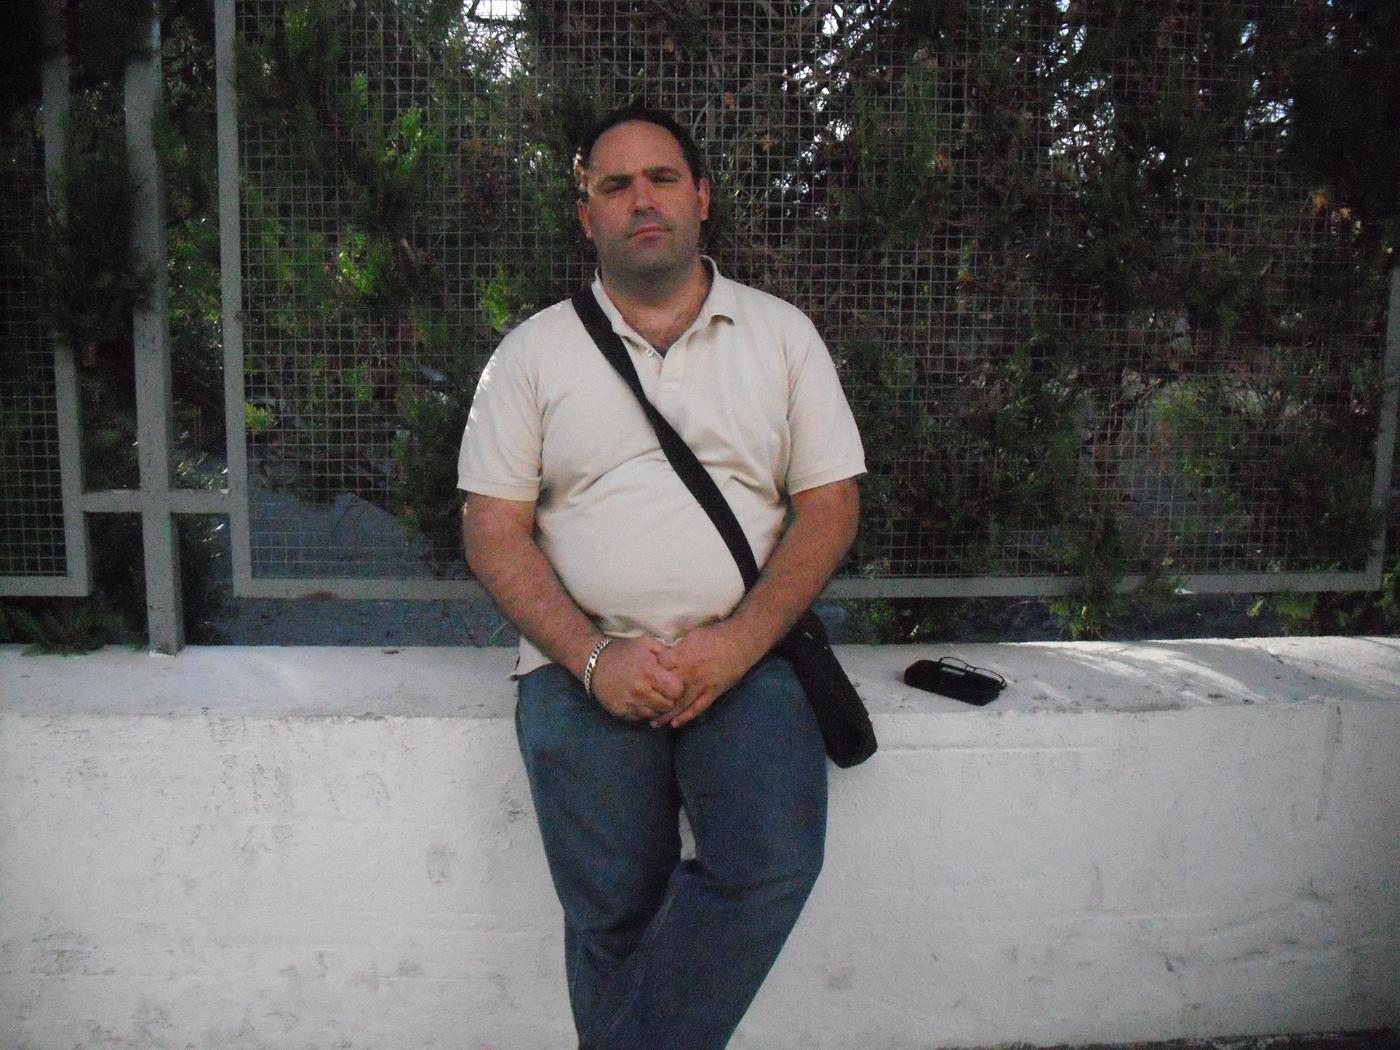 Antonio Garcia Prats